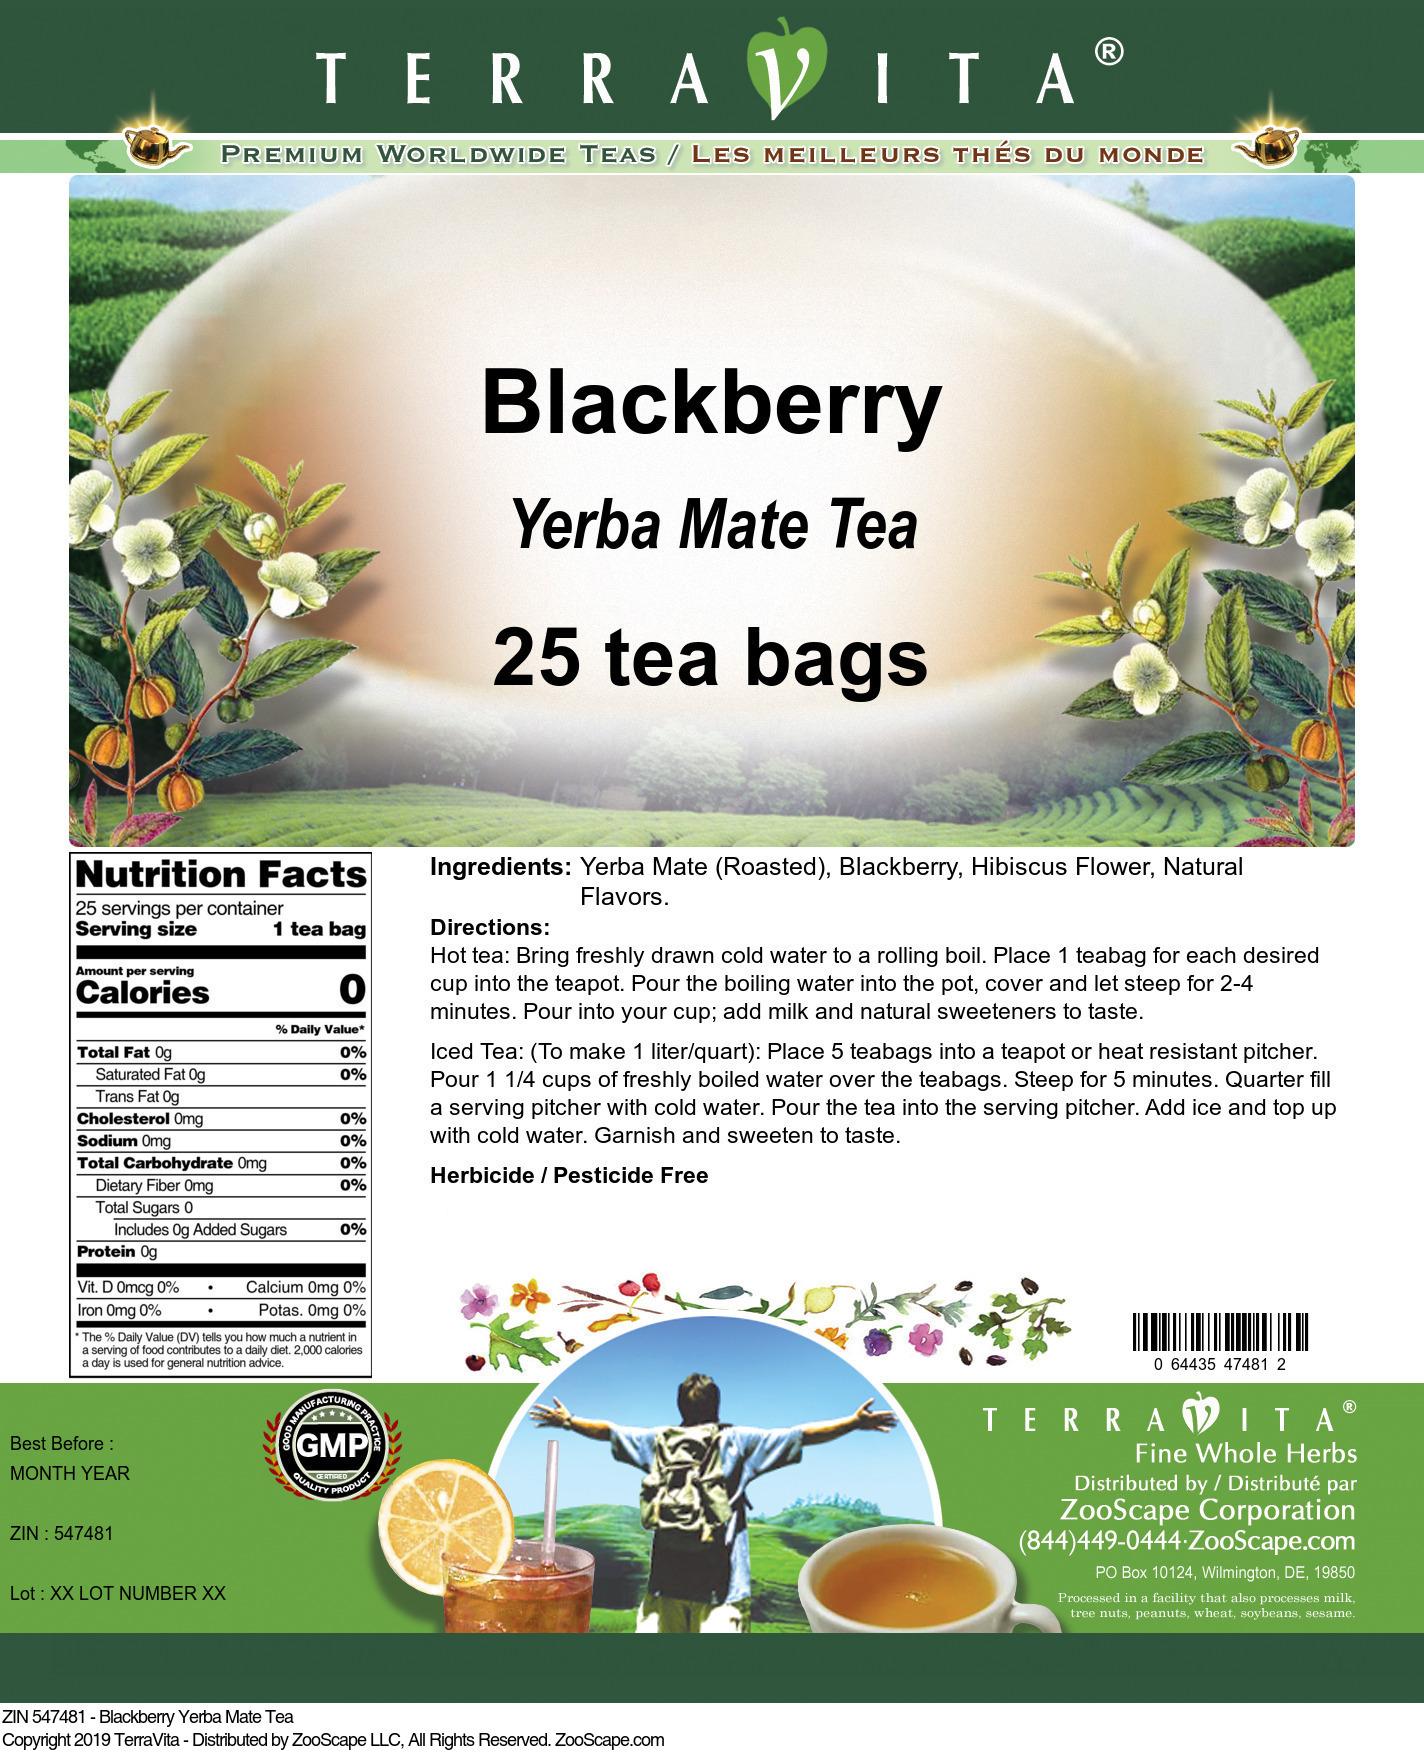 Blackberry Yerba Mate Tea